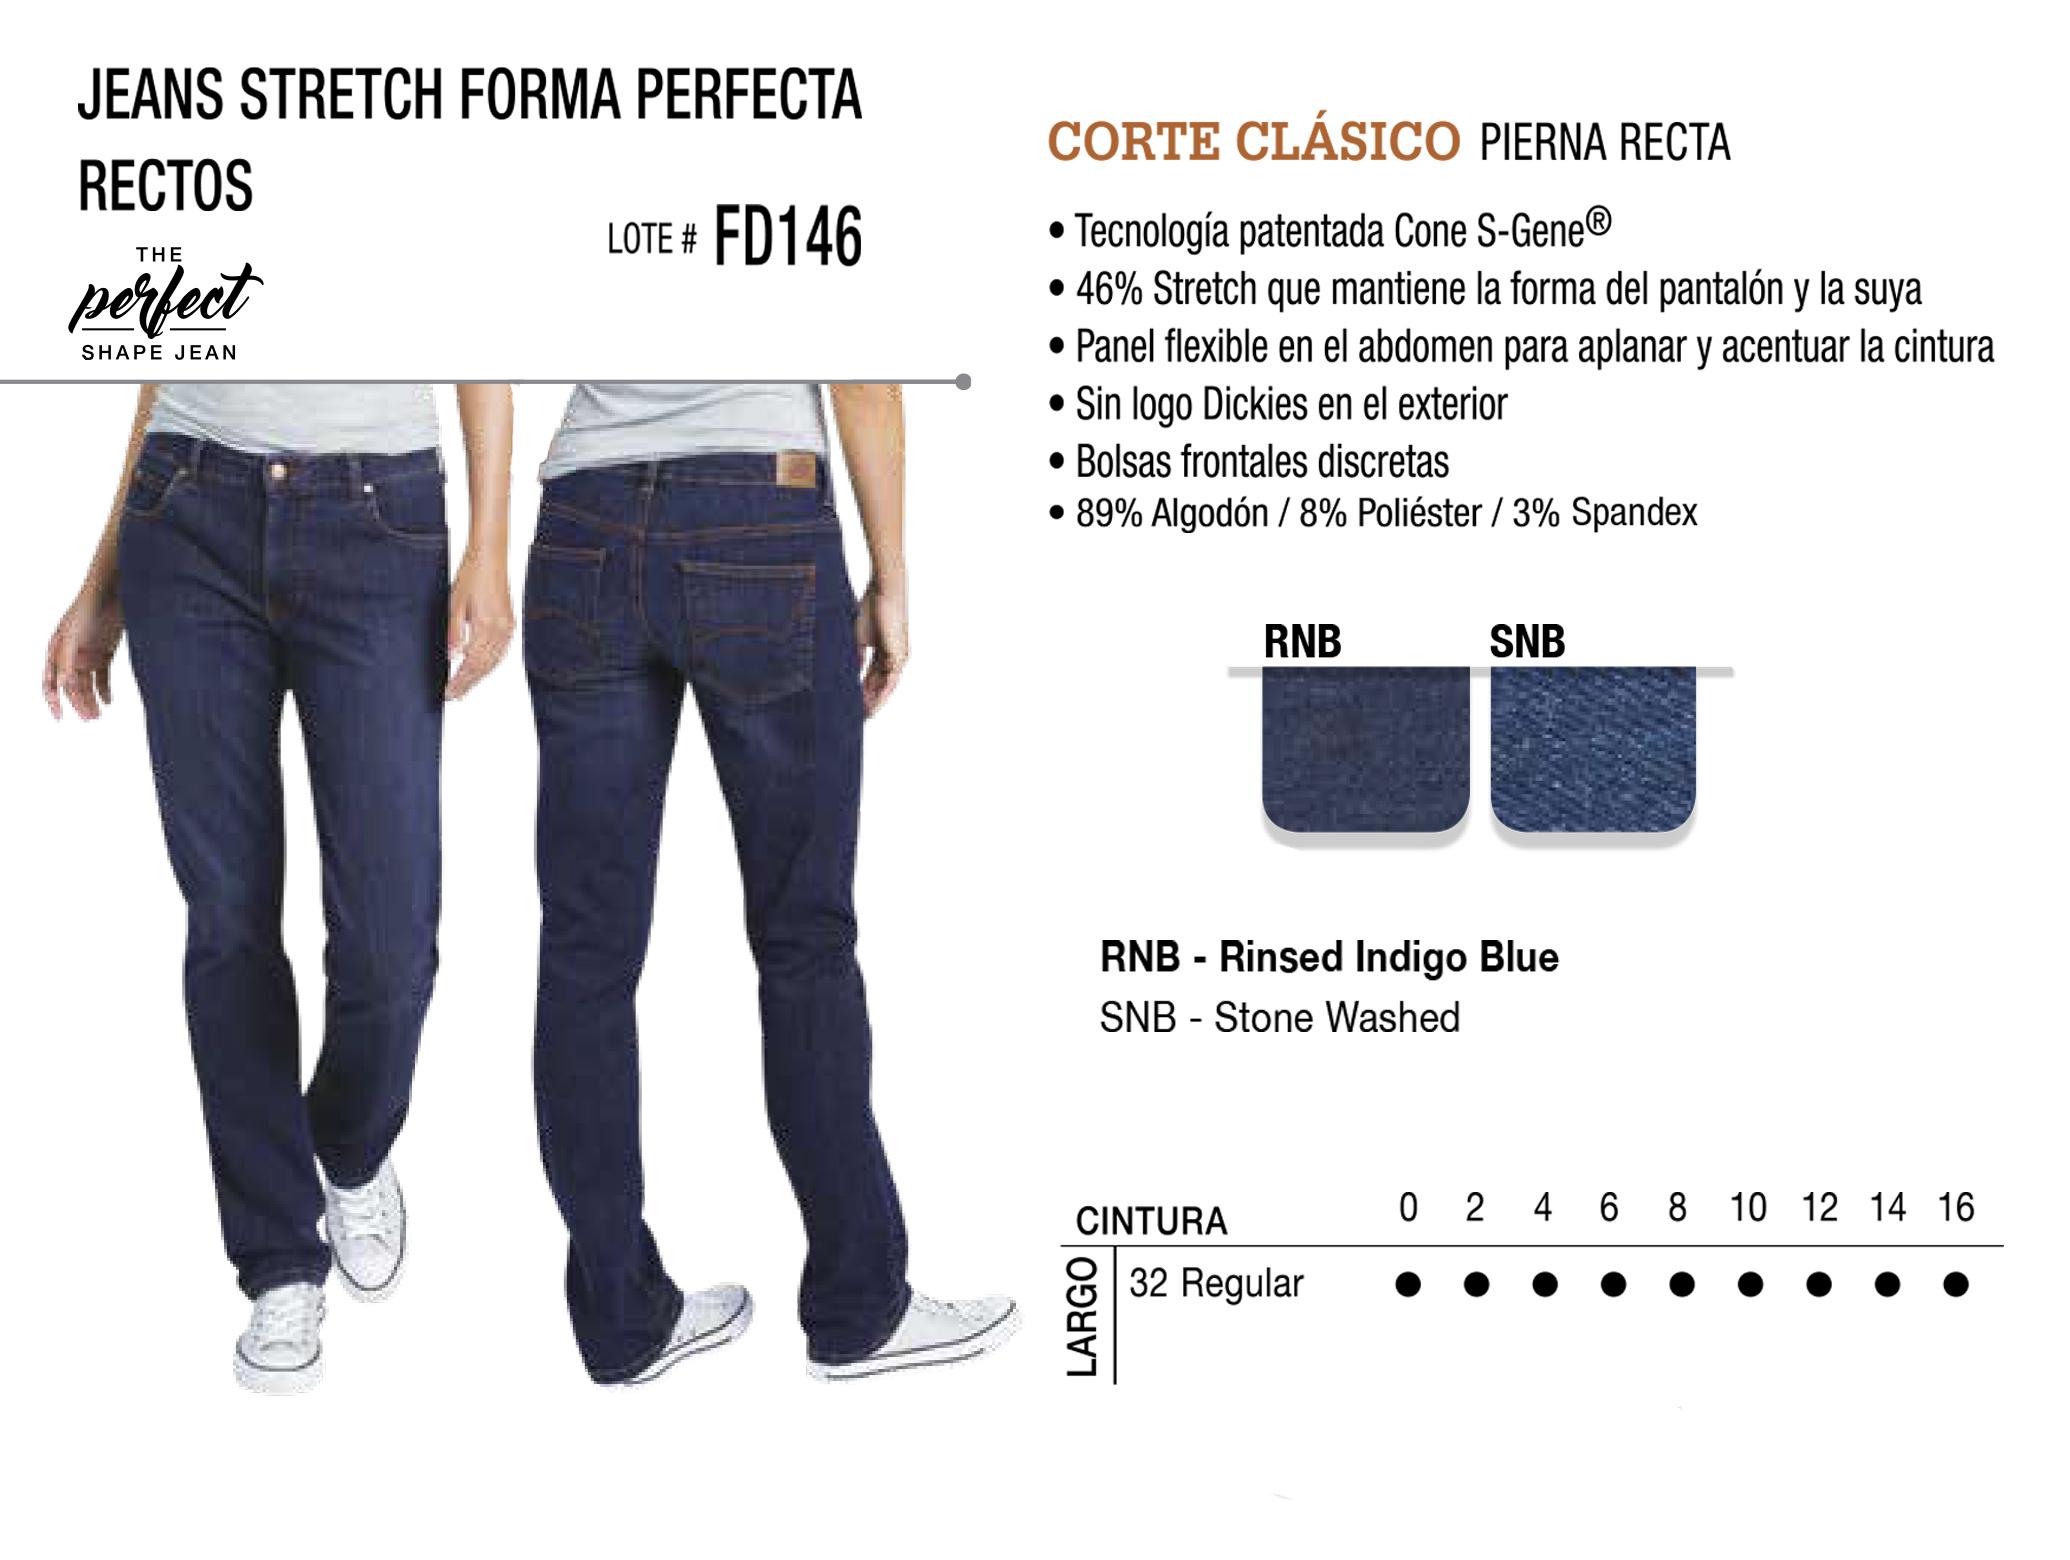 Jeans Stretch Forma Perfecta. Corte Clásico. FD146.